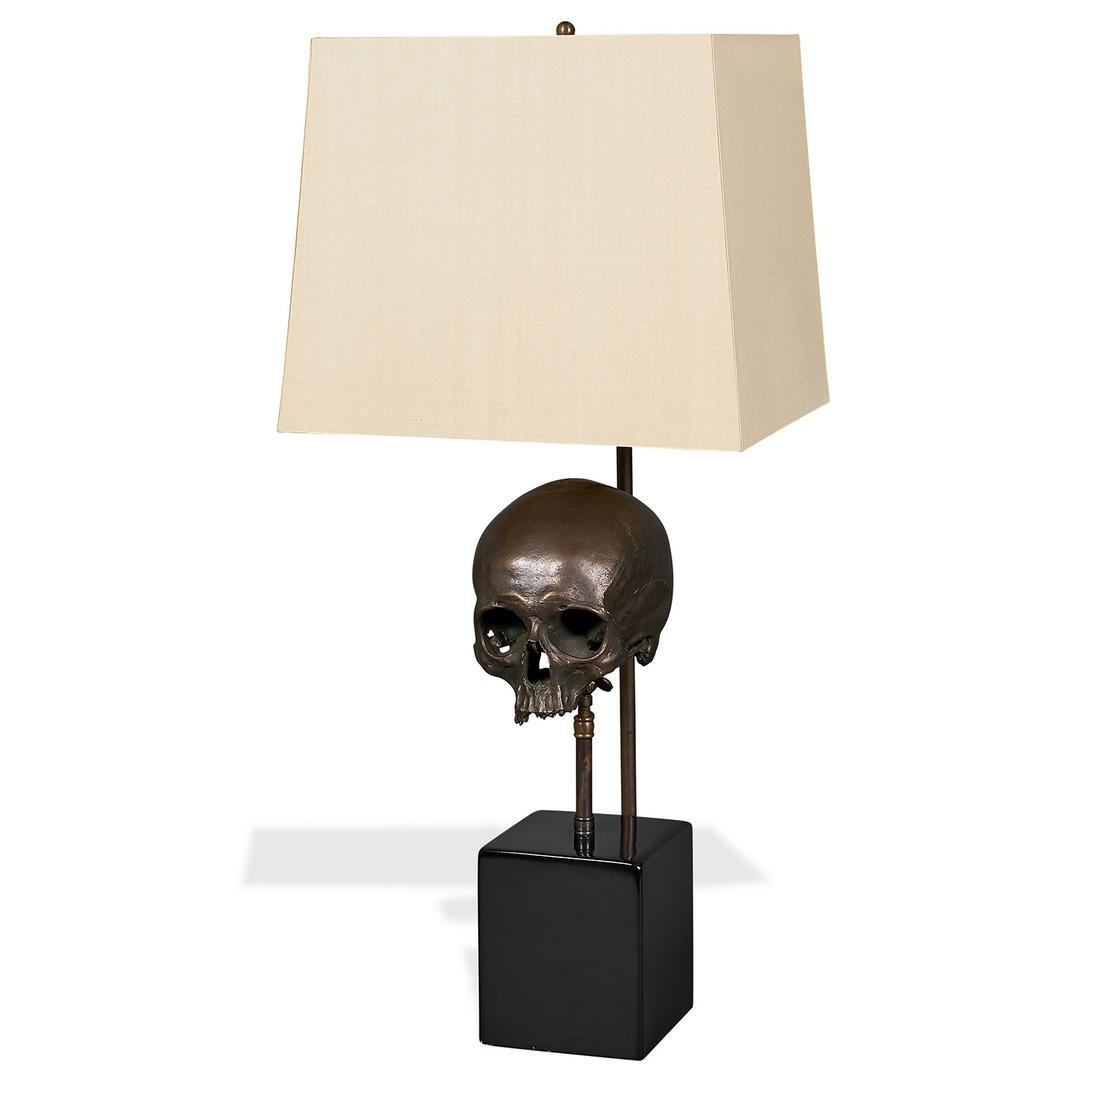 Blackman Cruz Workshop Skull table lamp